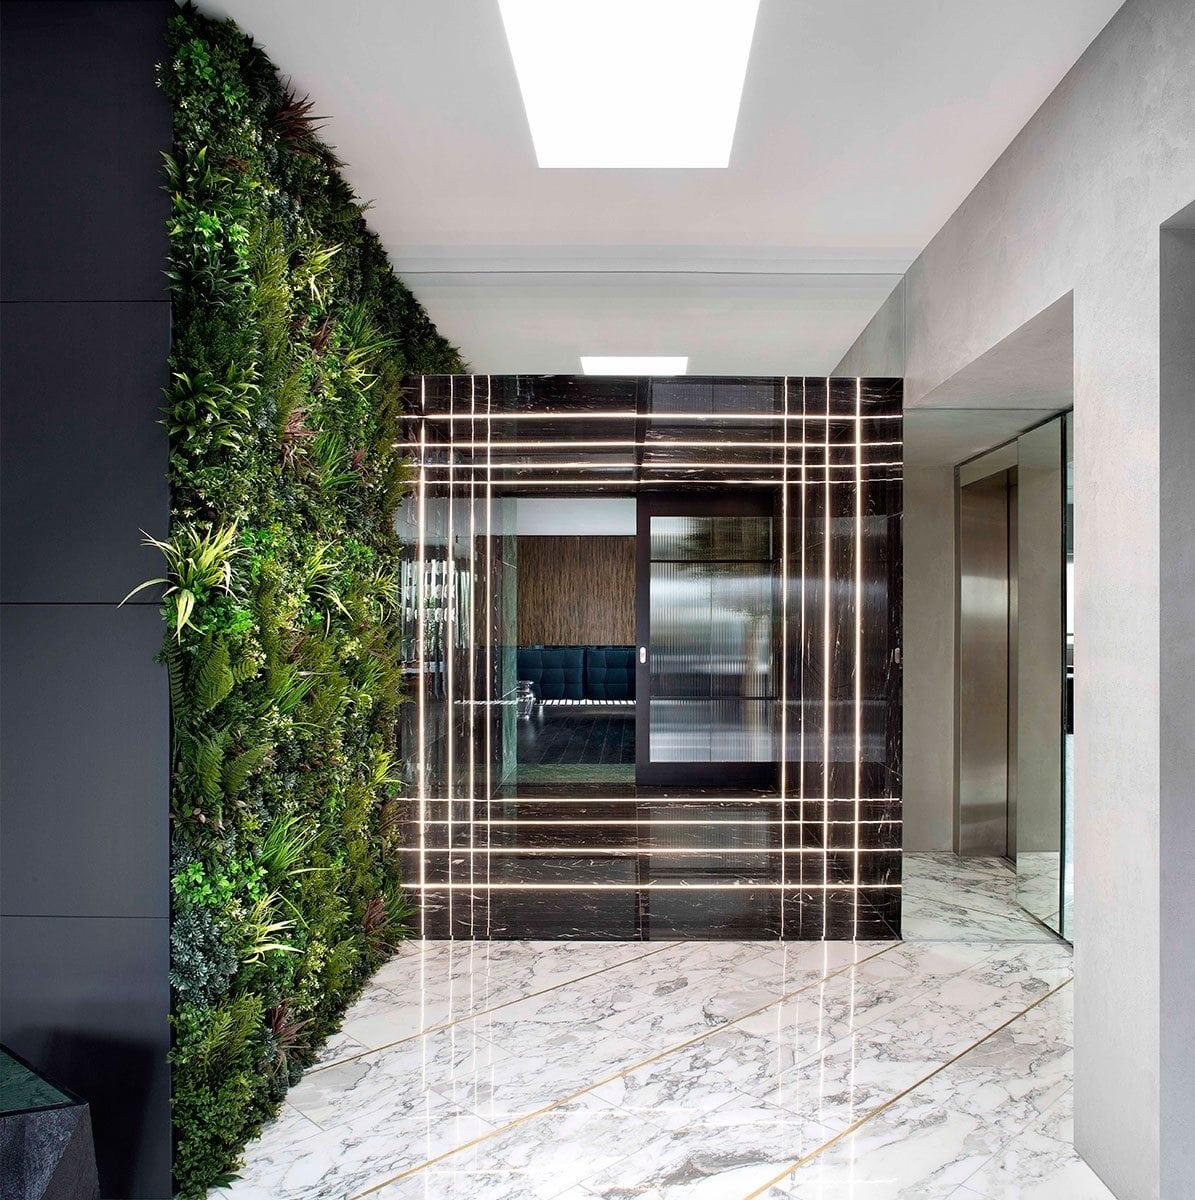 Stephens green marble corridor